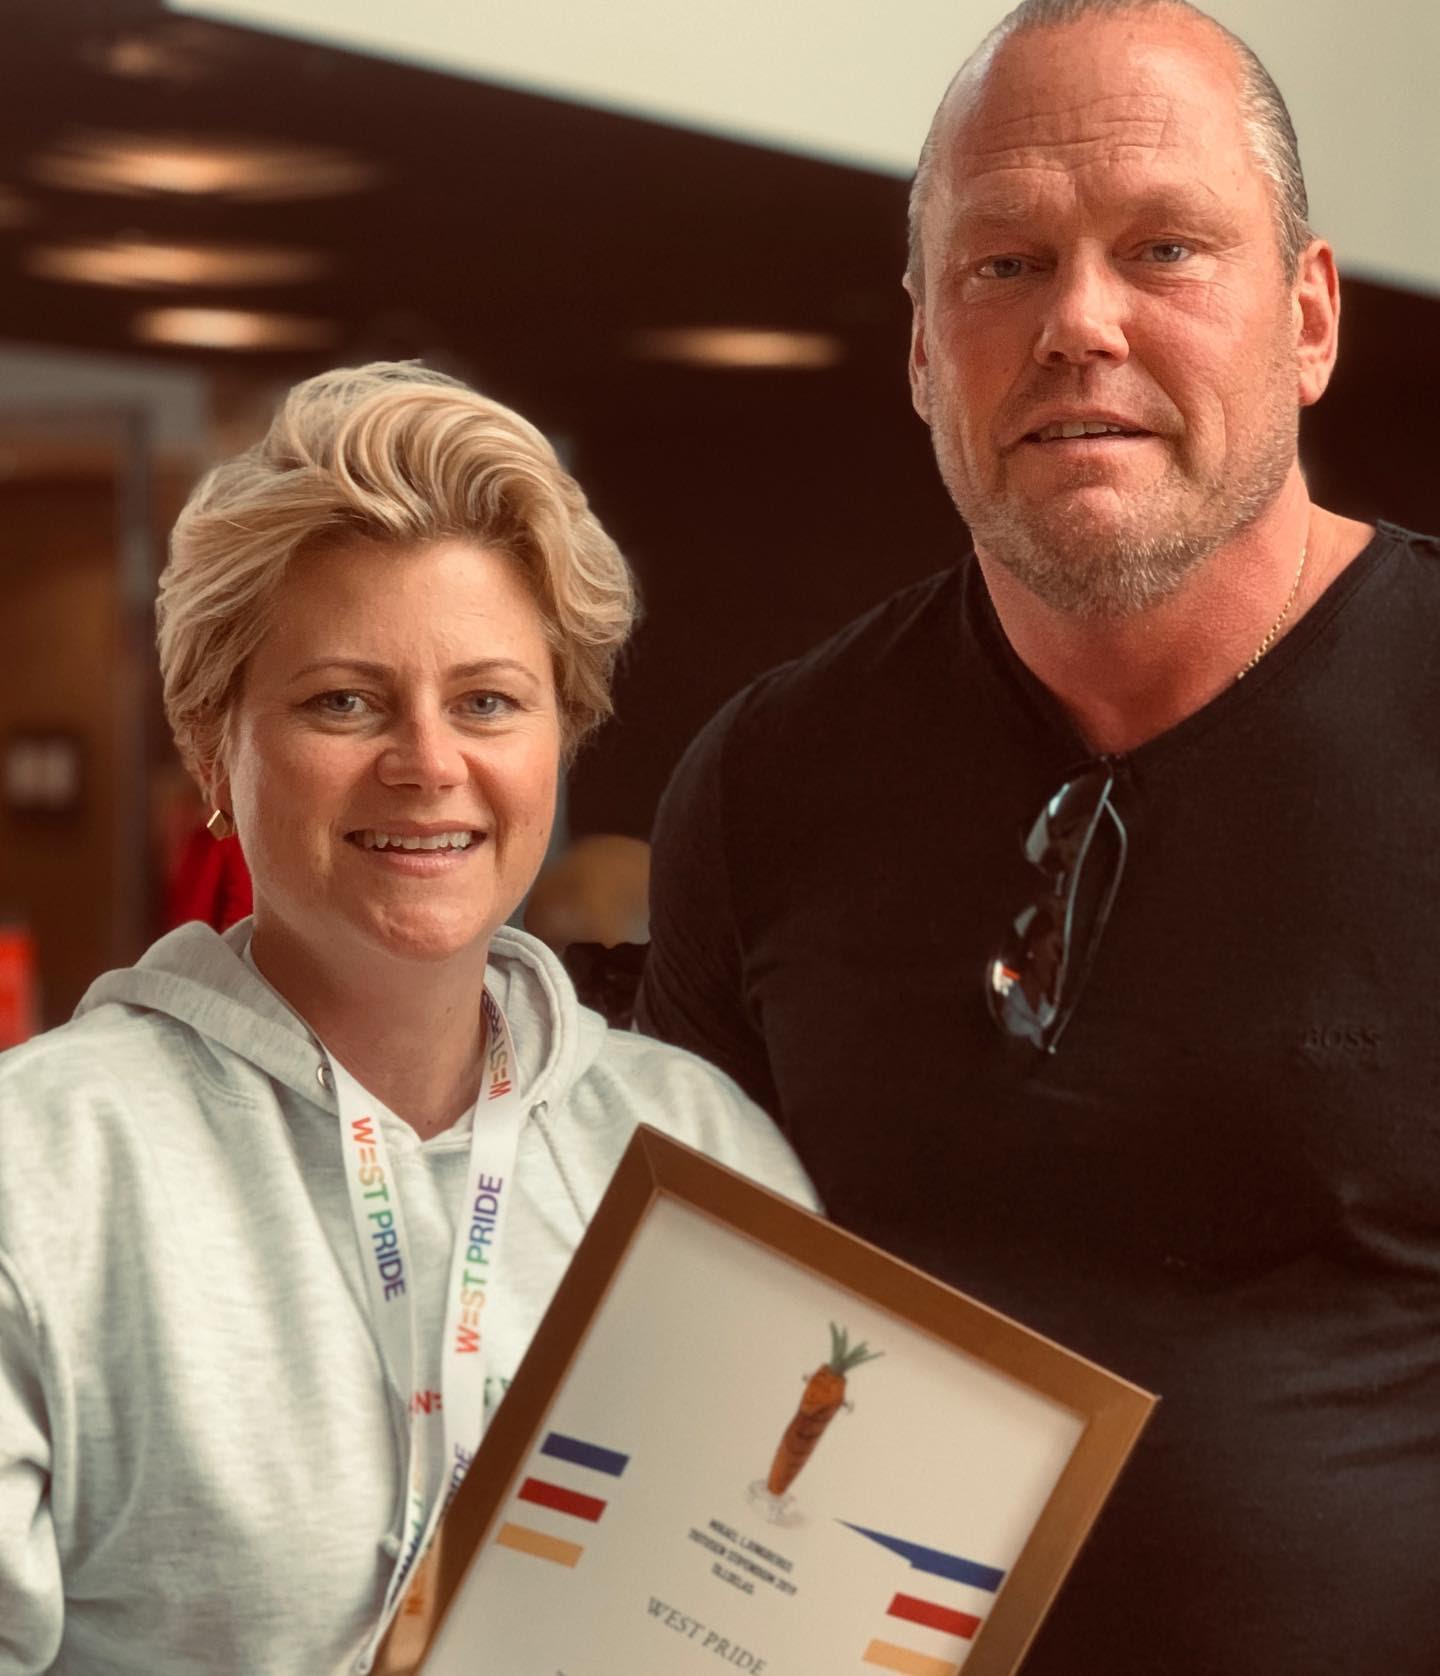 Mikael Ljungbergs minnesfond delar ut stipendium till West Pride